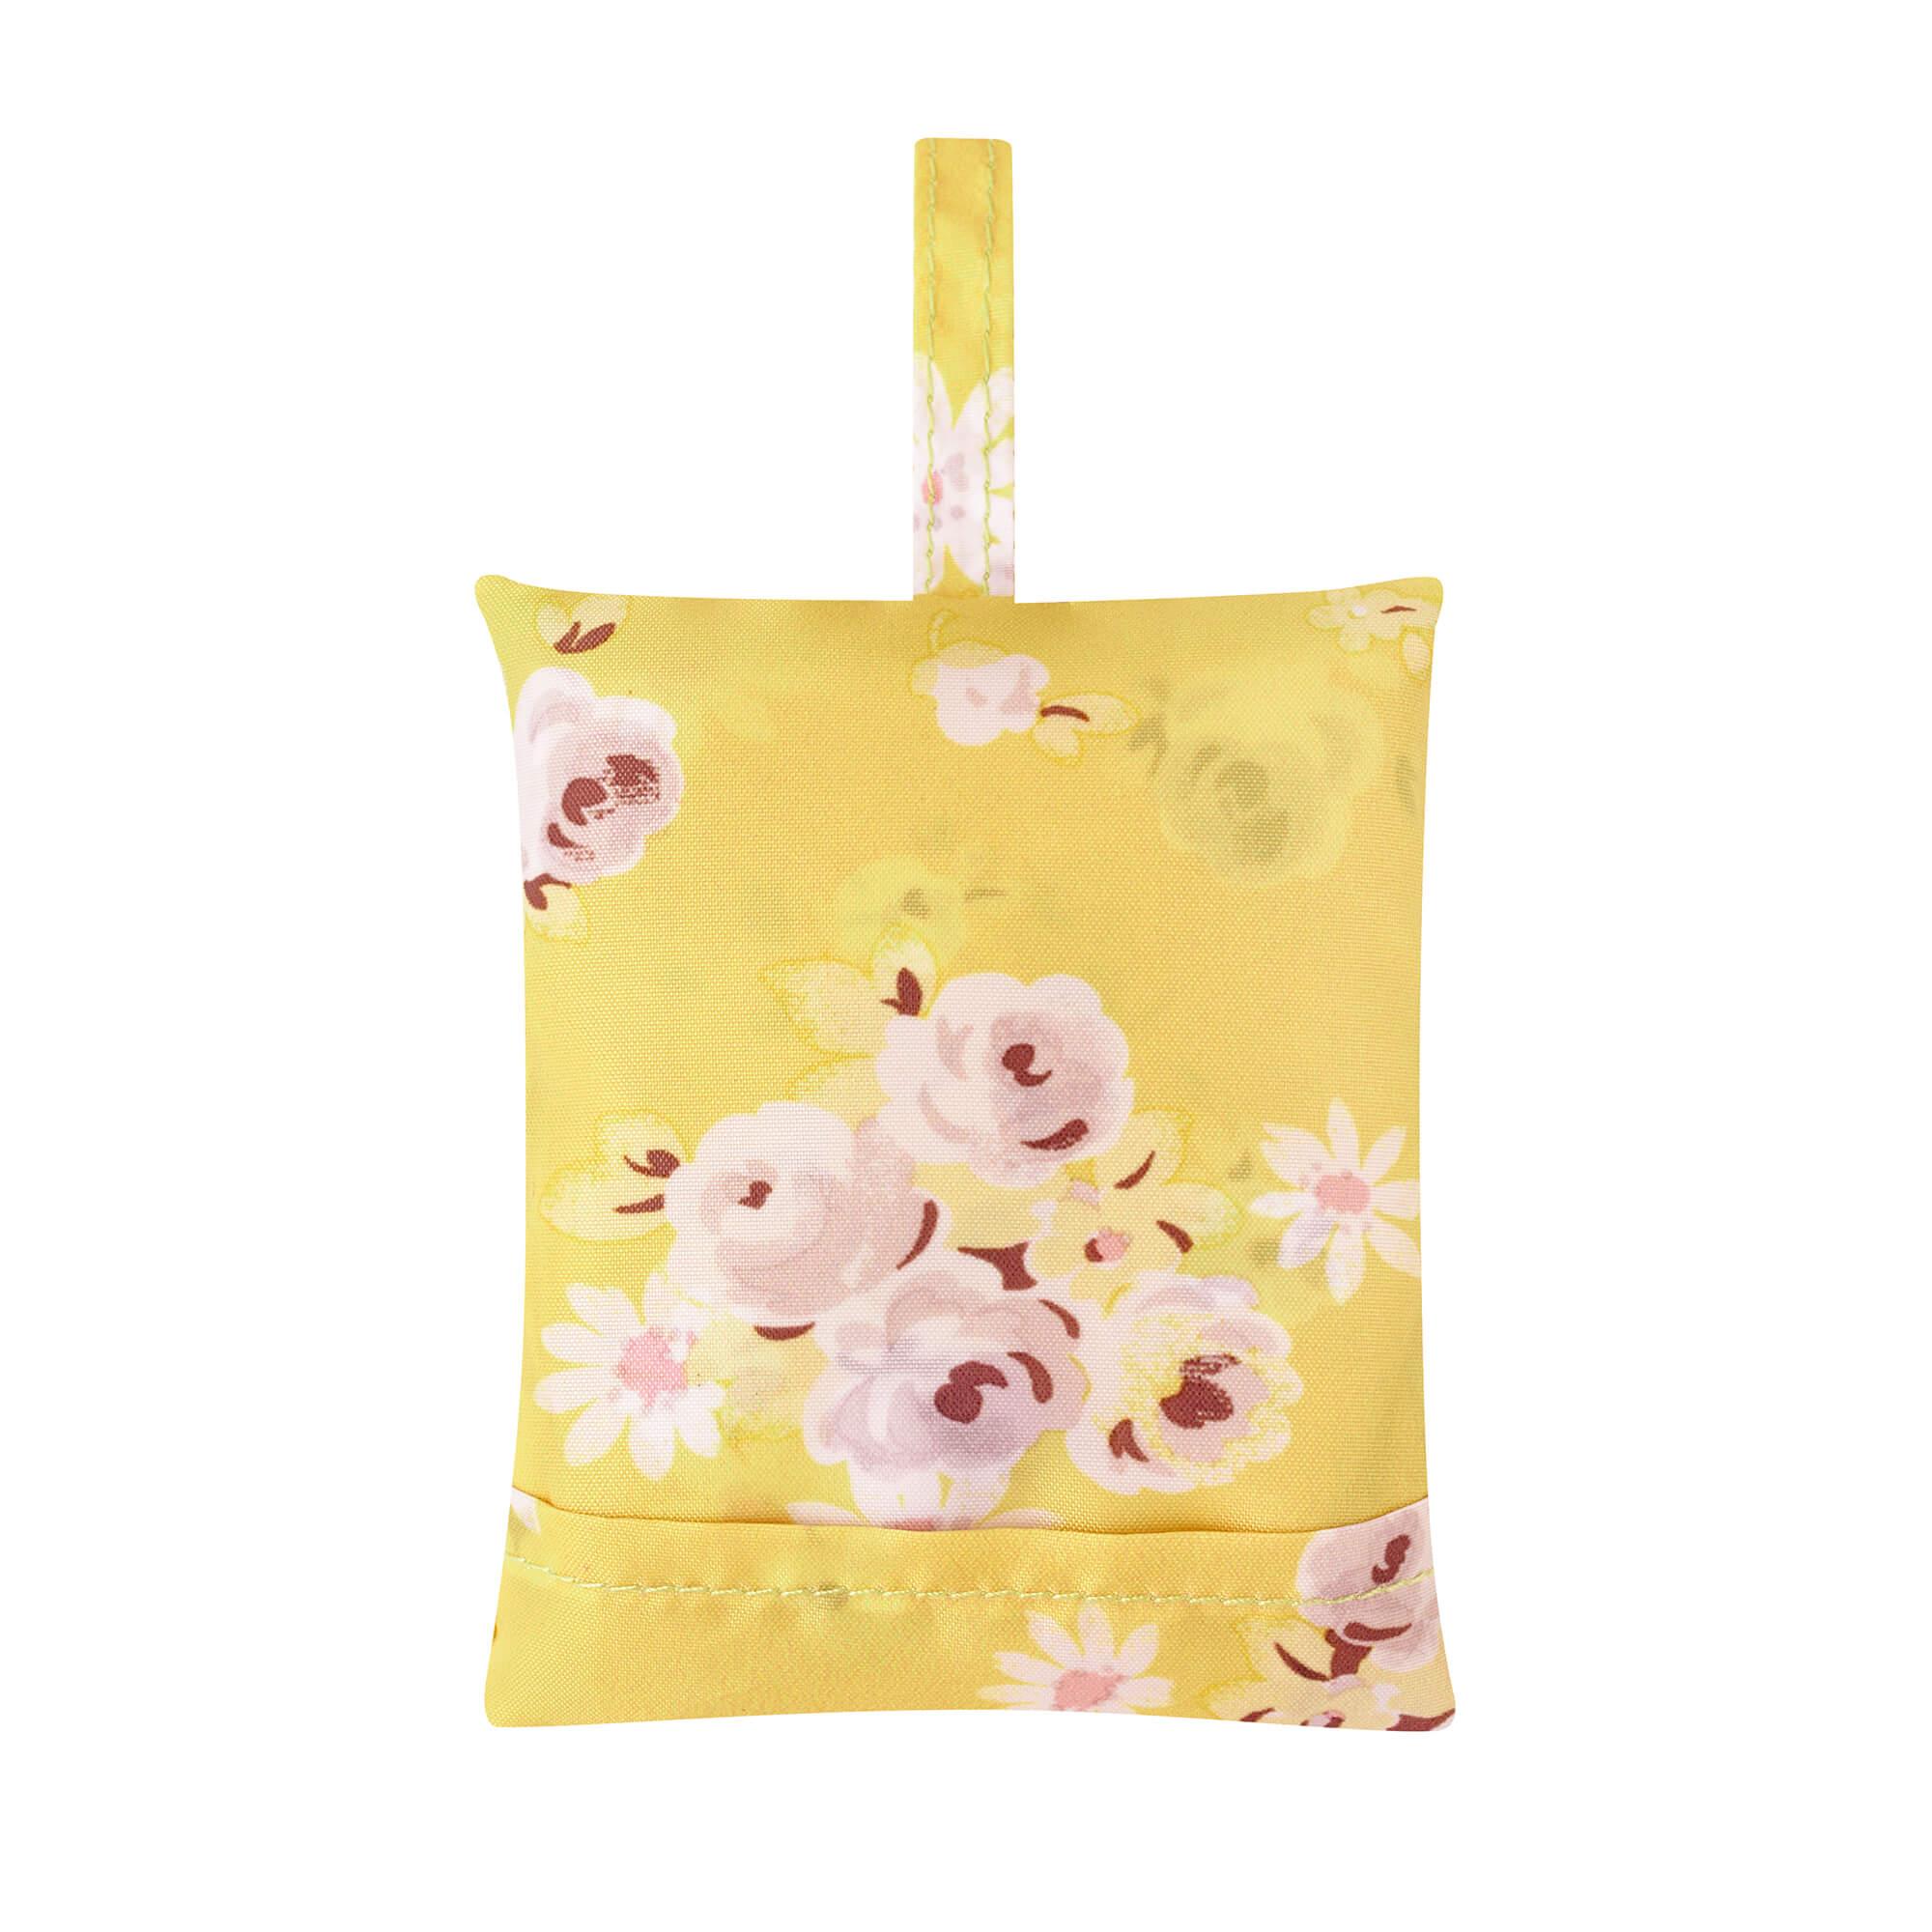 Image of Cath Kidston Rose Foldaway Shopper, Light Pink